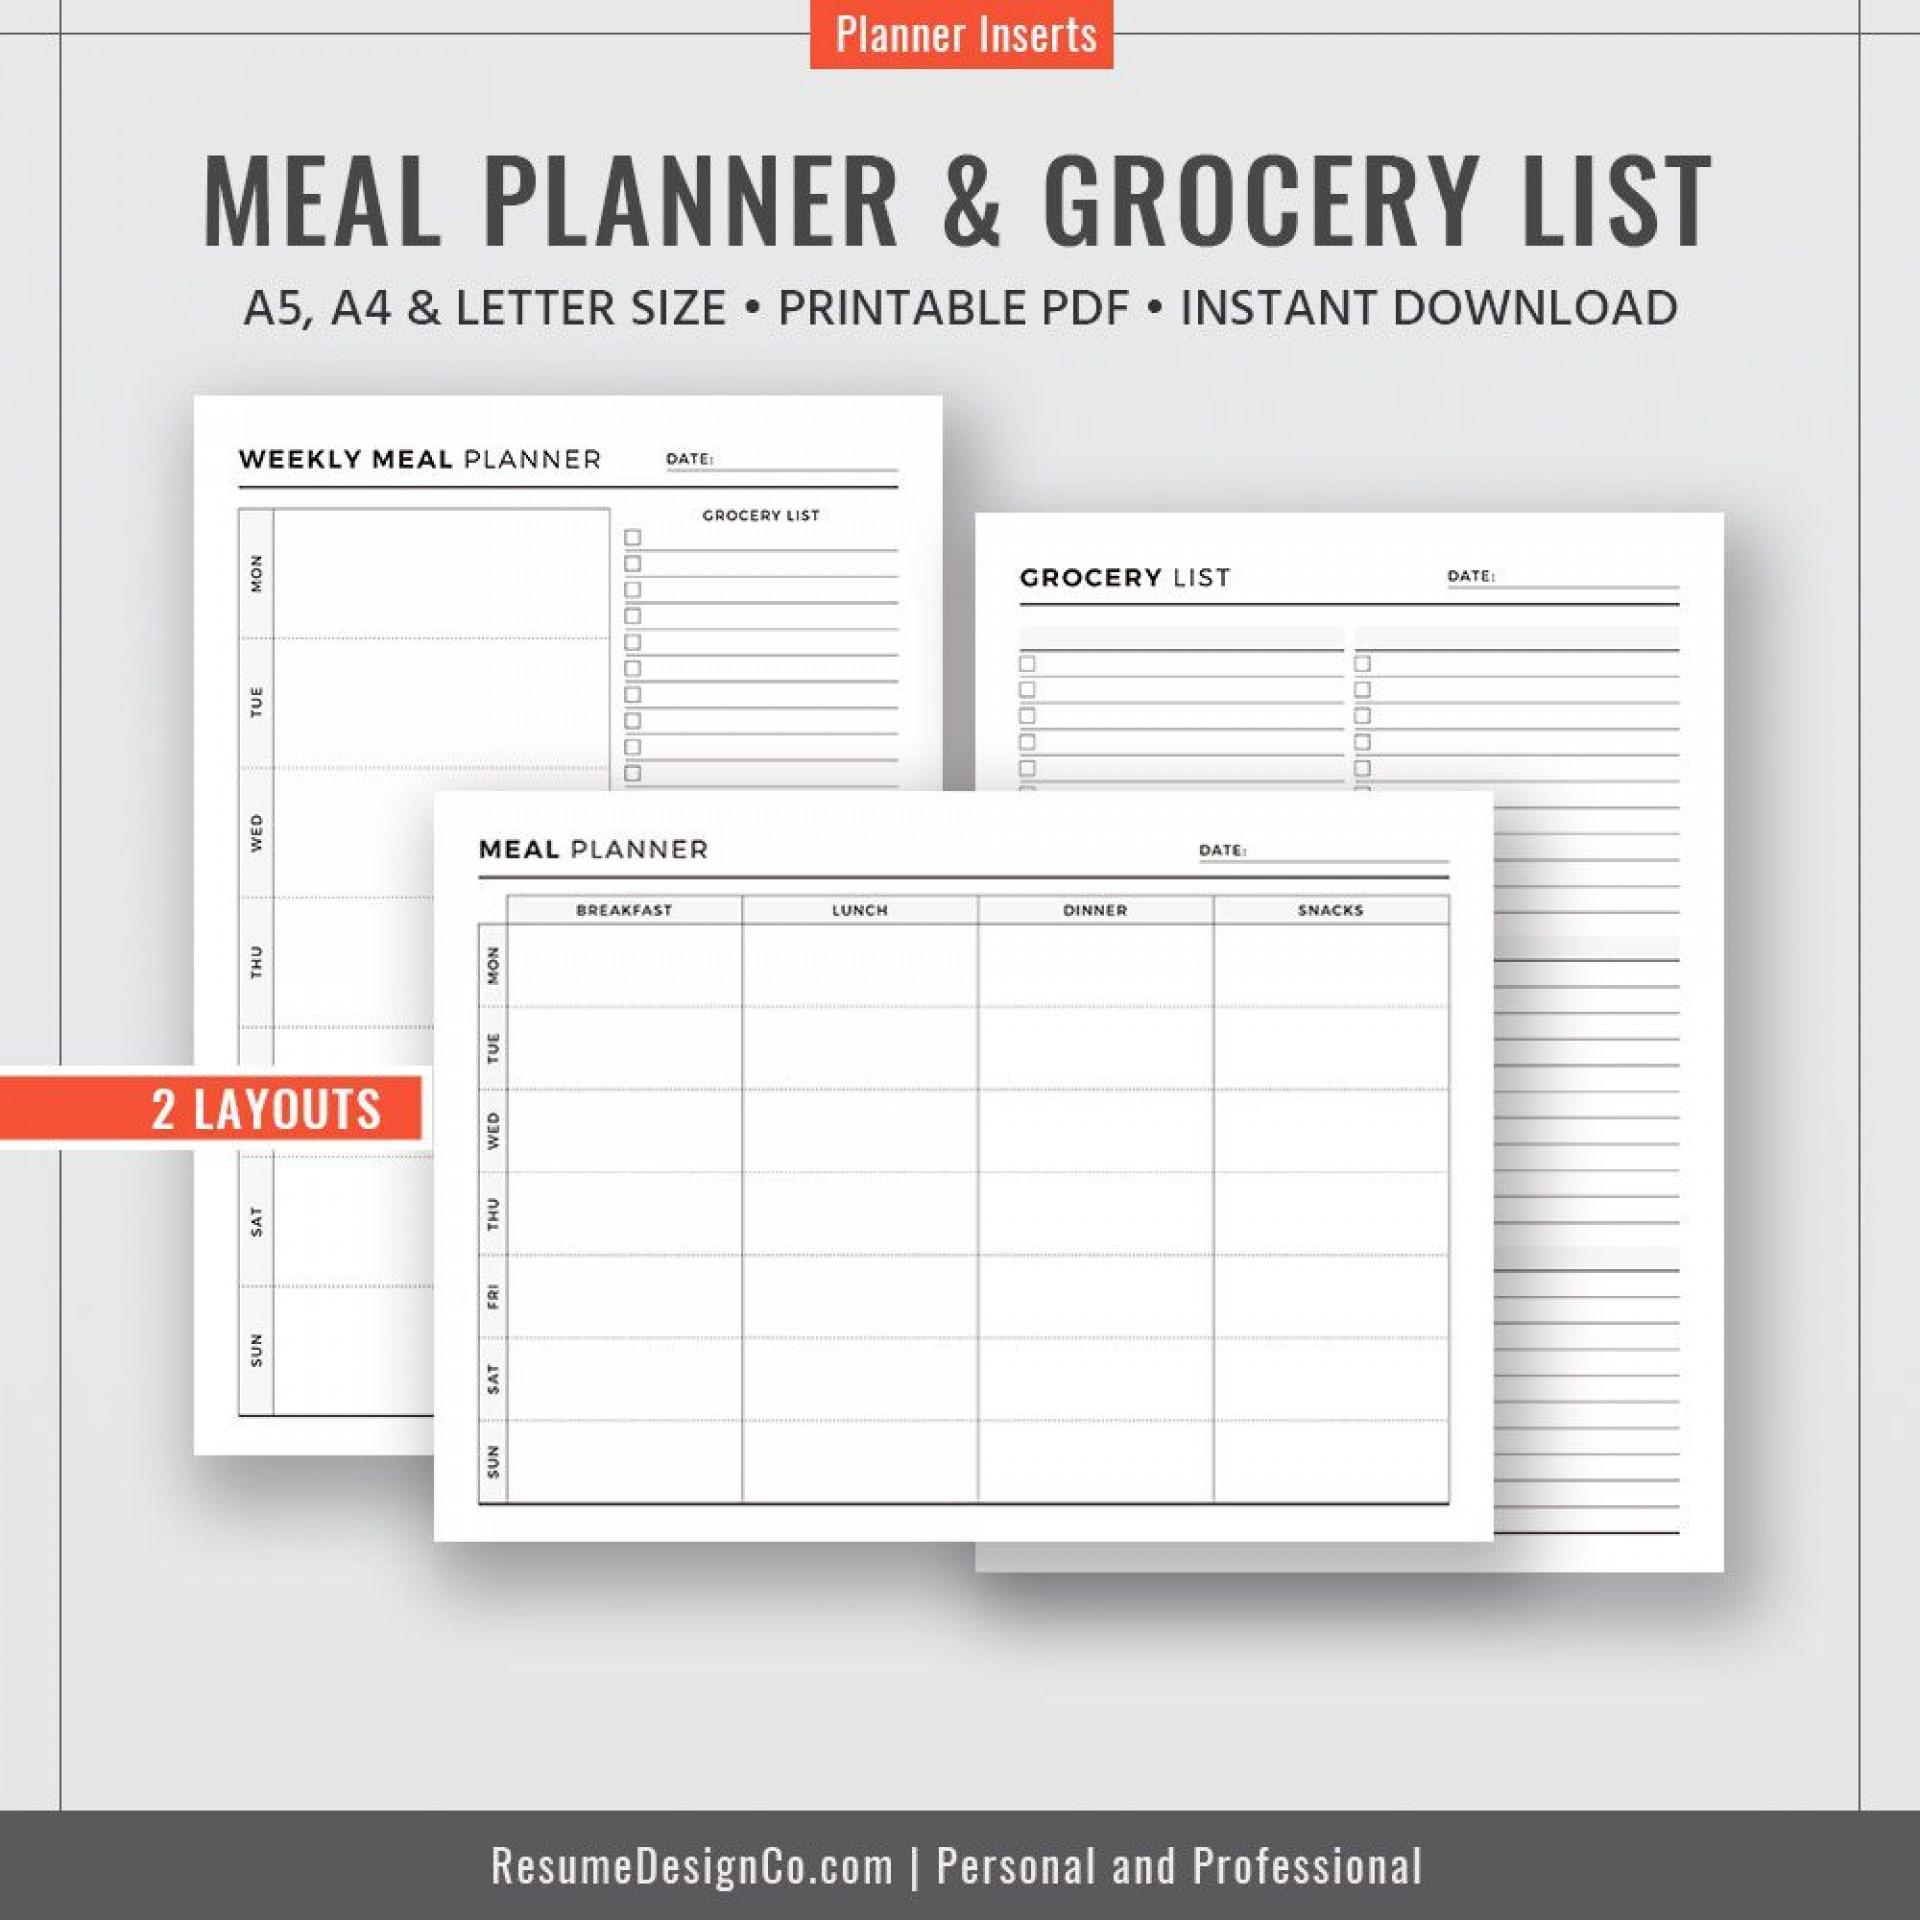 009 Unforgettable Weekly Meal Planning Worksheet Pdf Photo  Free1920